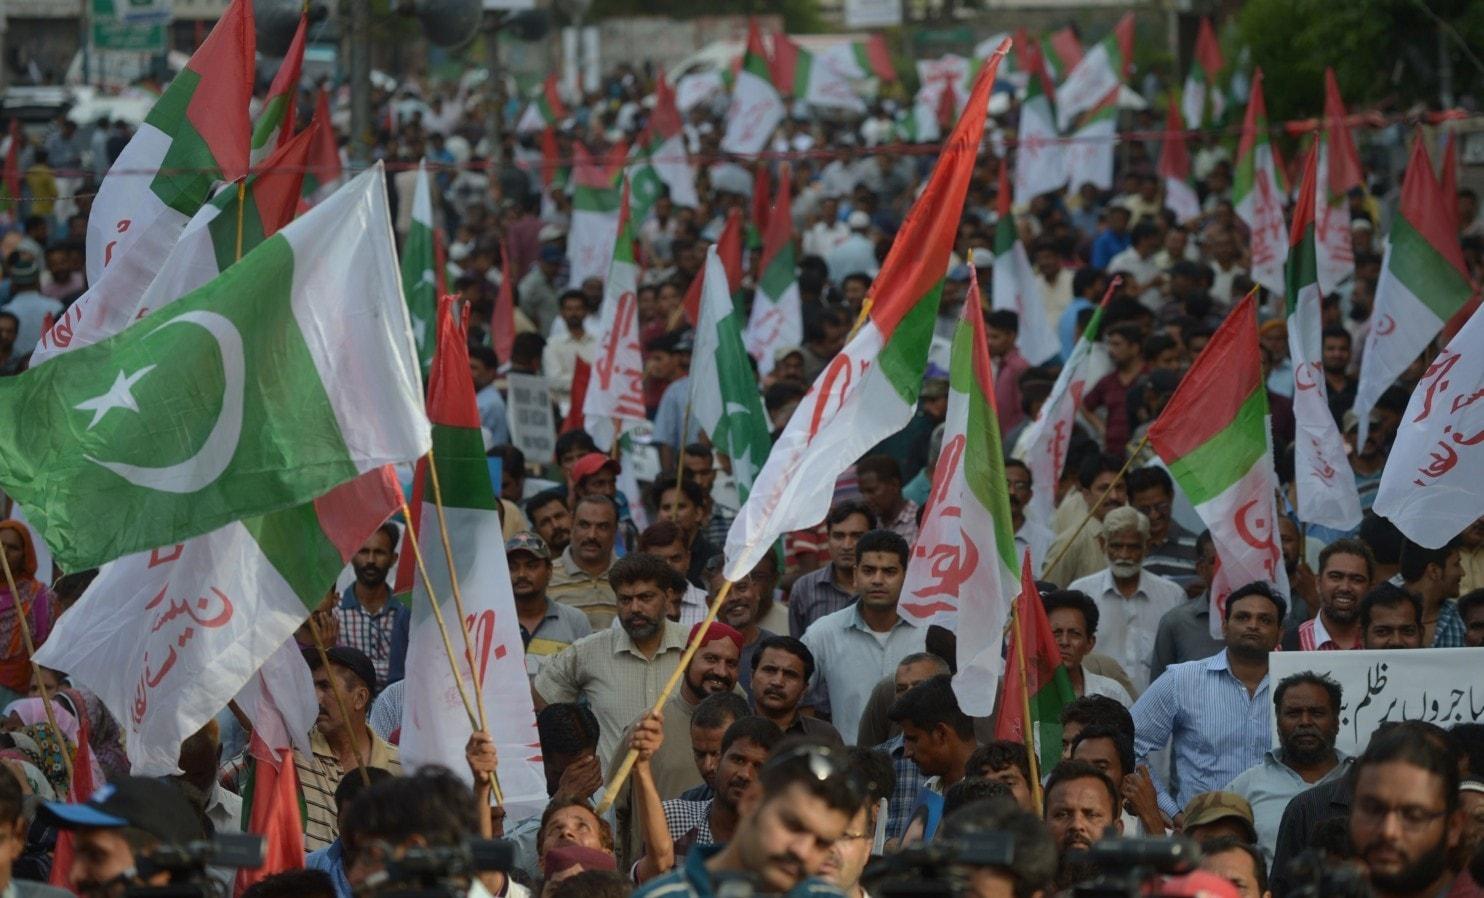 Altaf Hussain: Politics on mute